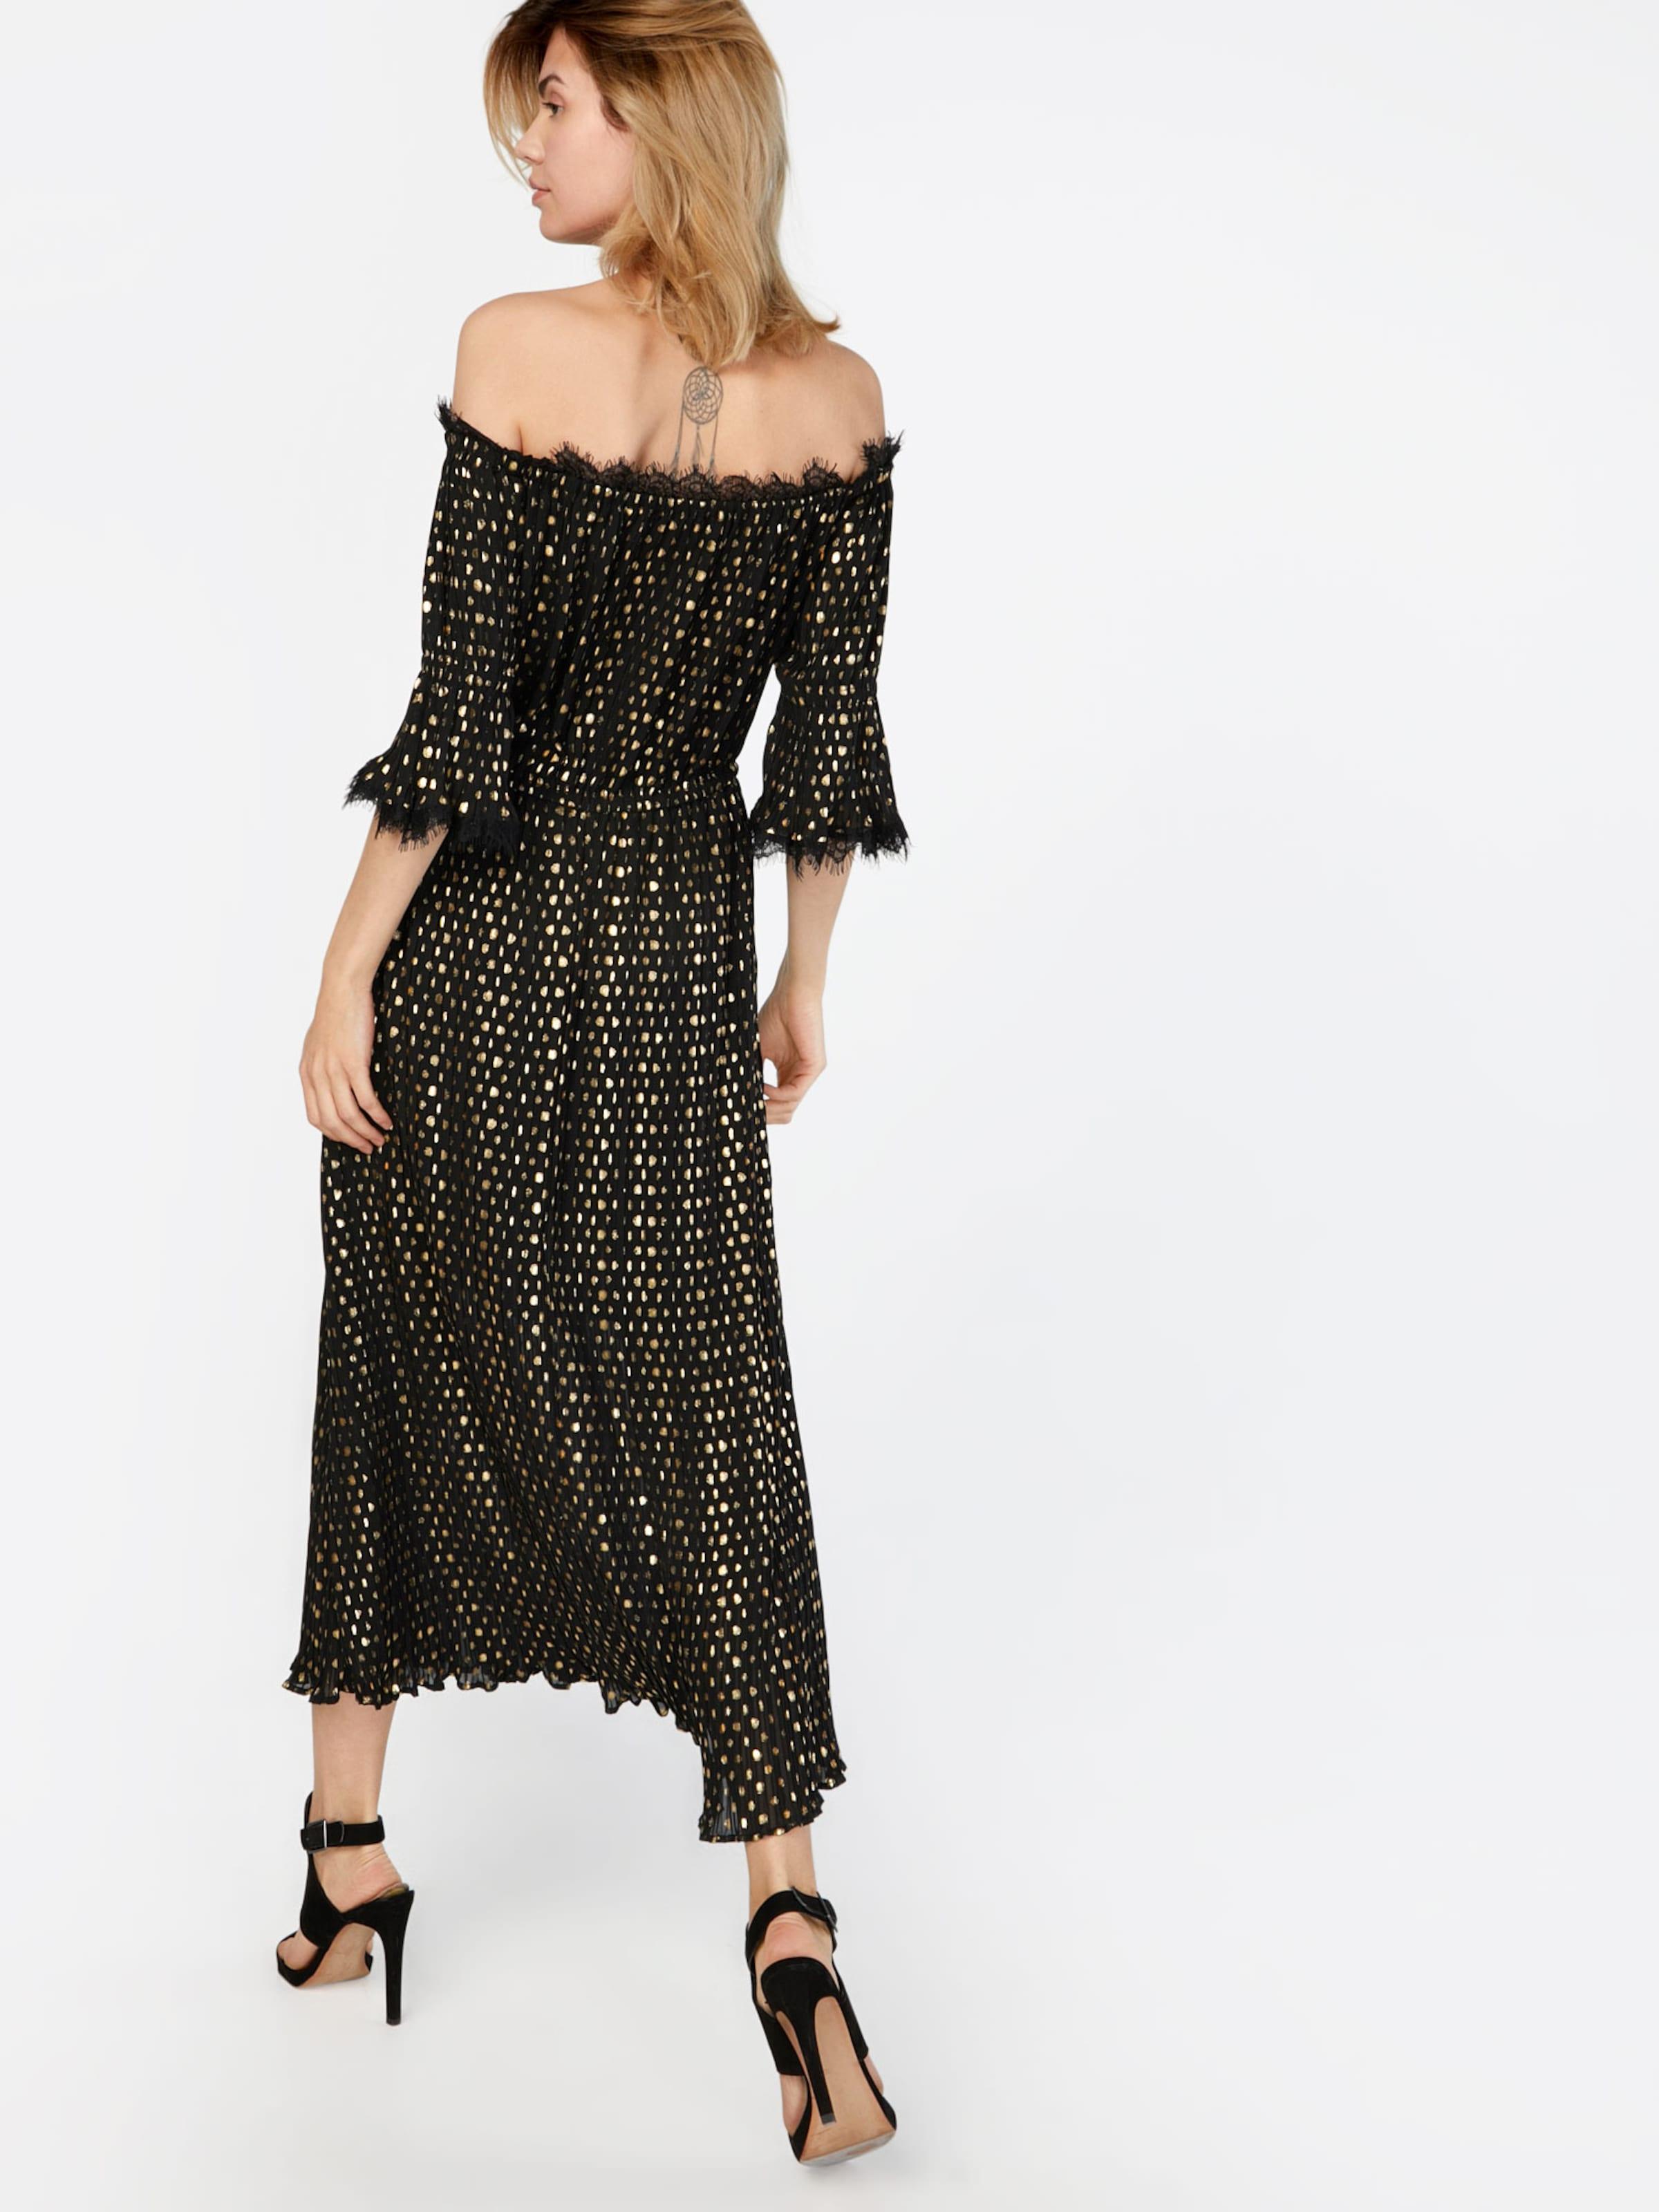 The Kooples Kleid 'LONG POLKA-DOT' Erhalten Authentisch 2018 Online-Verkauf X3Acg